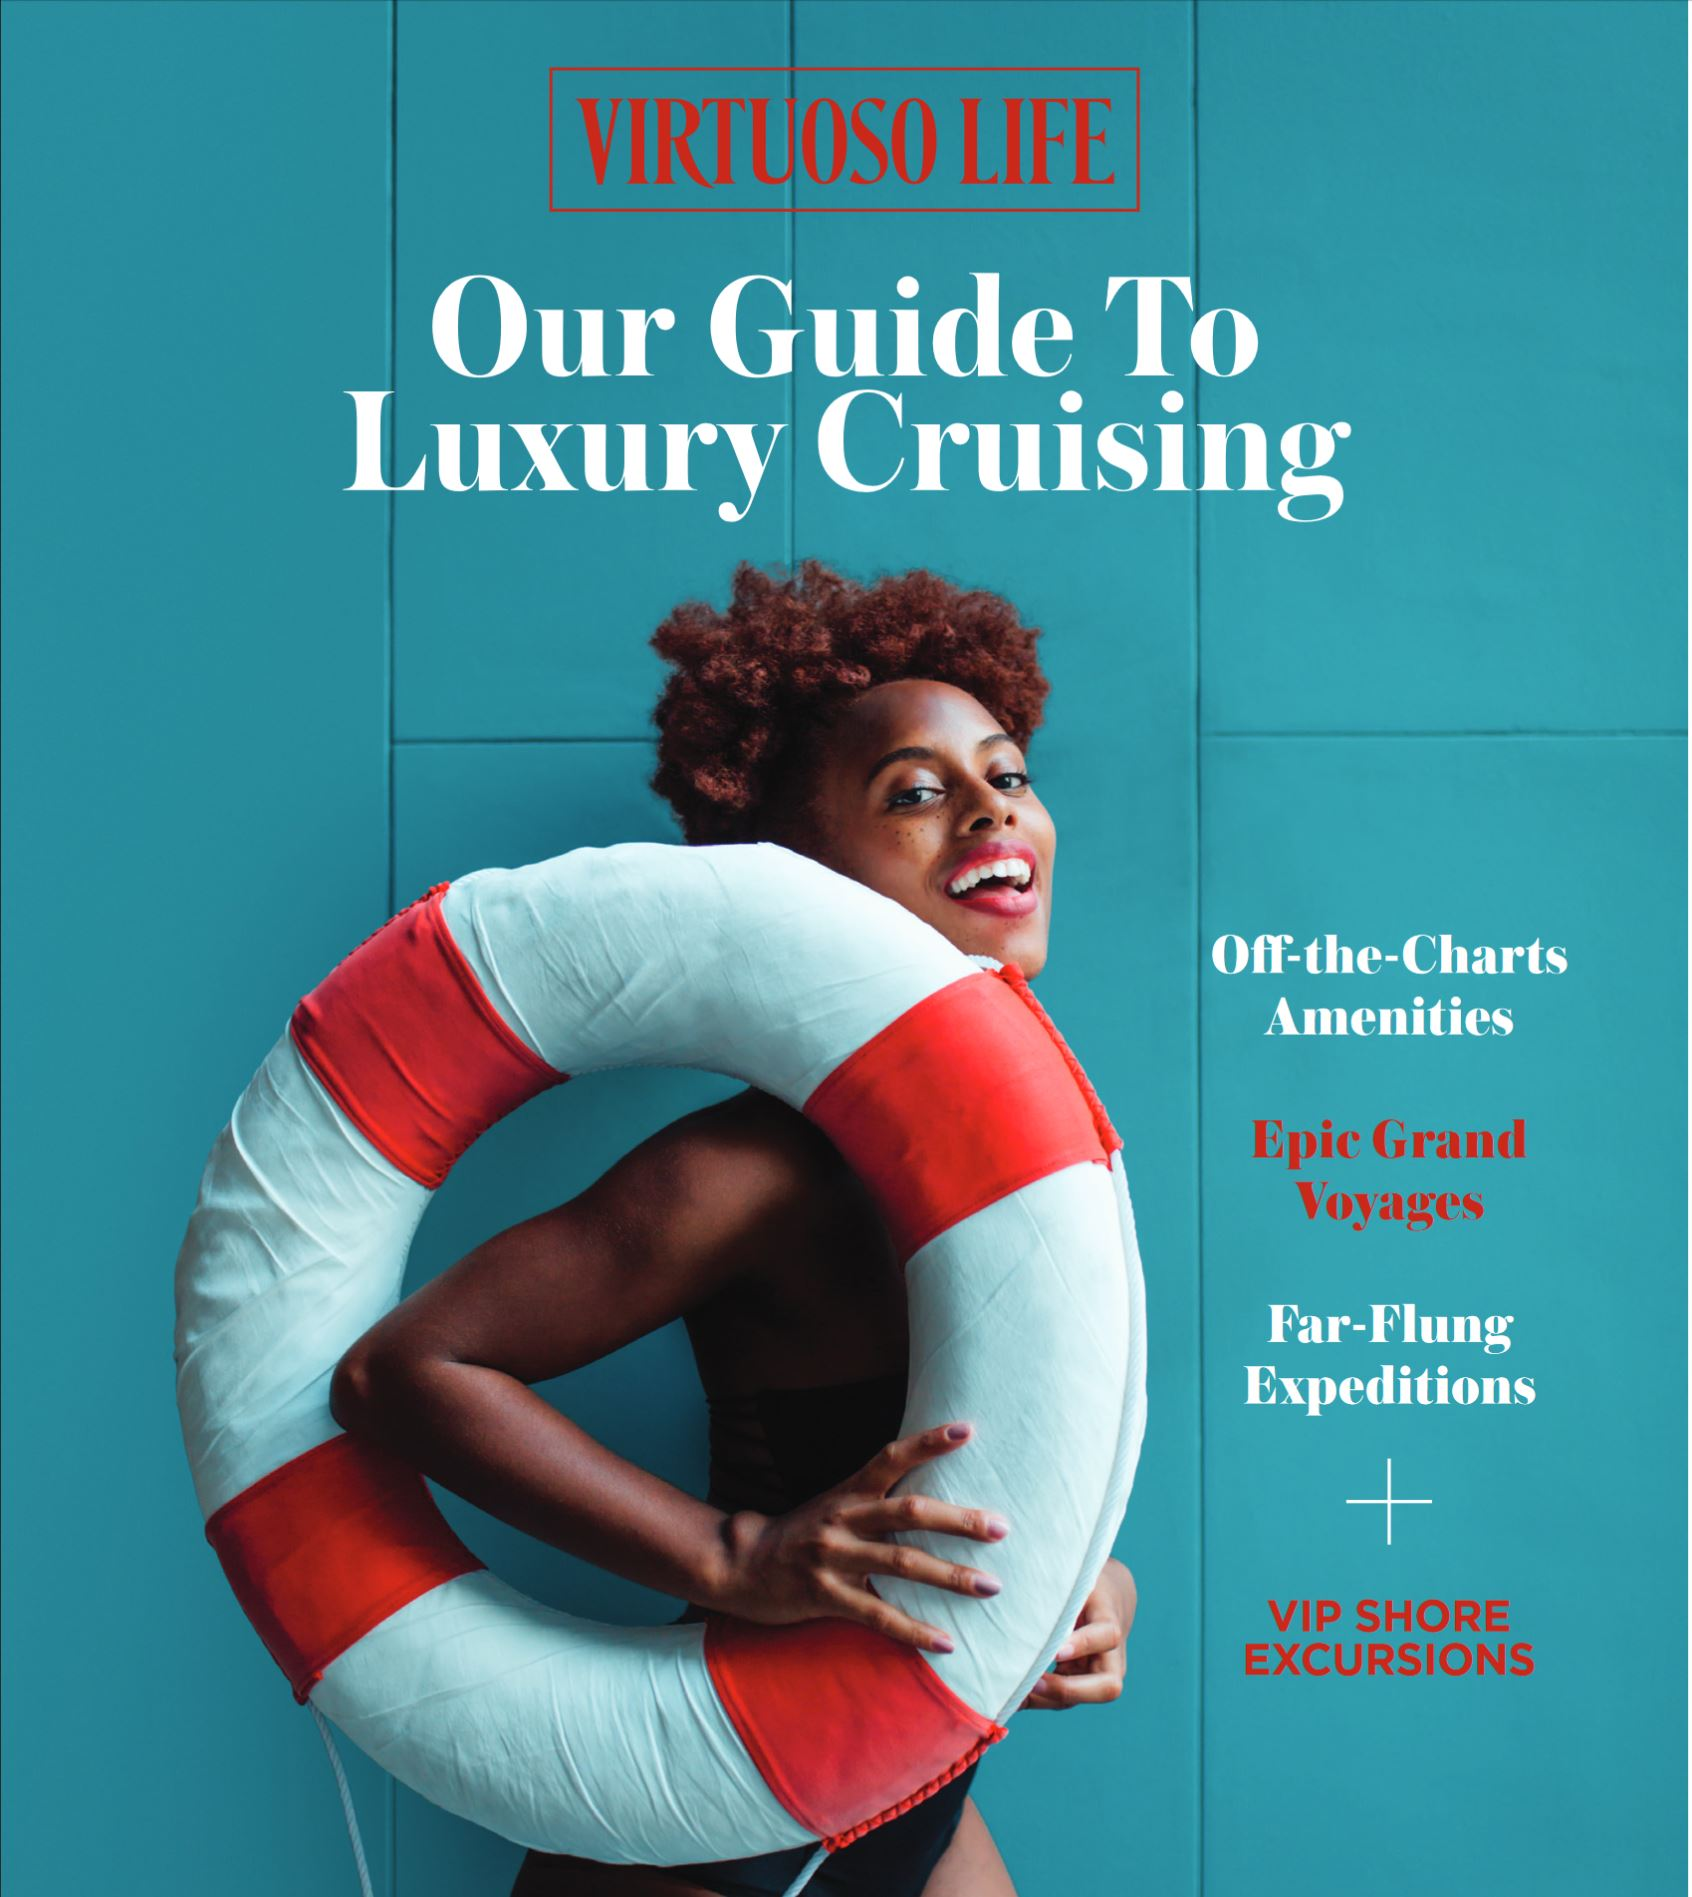 Guide To Luxury Cruising